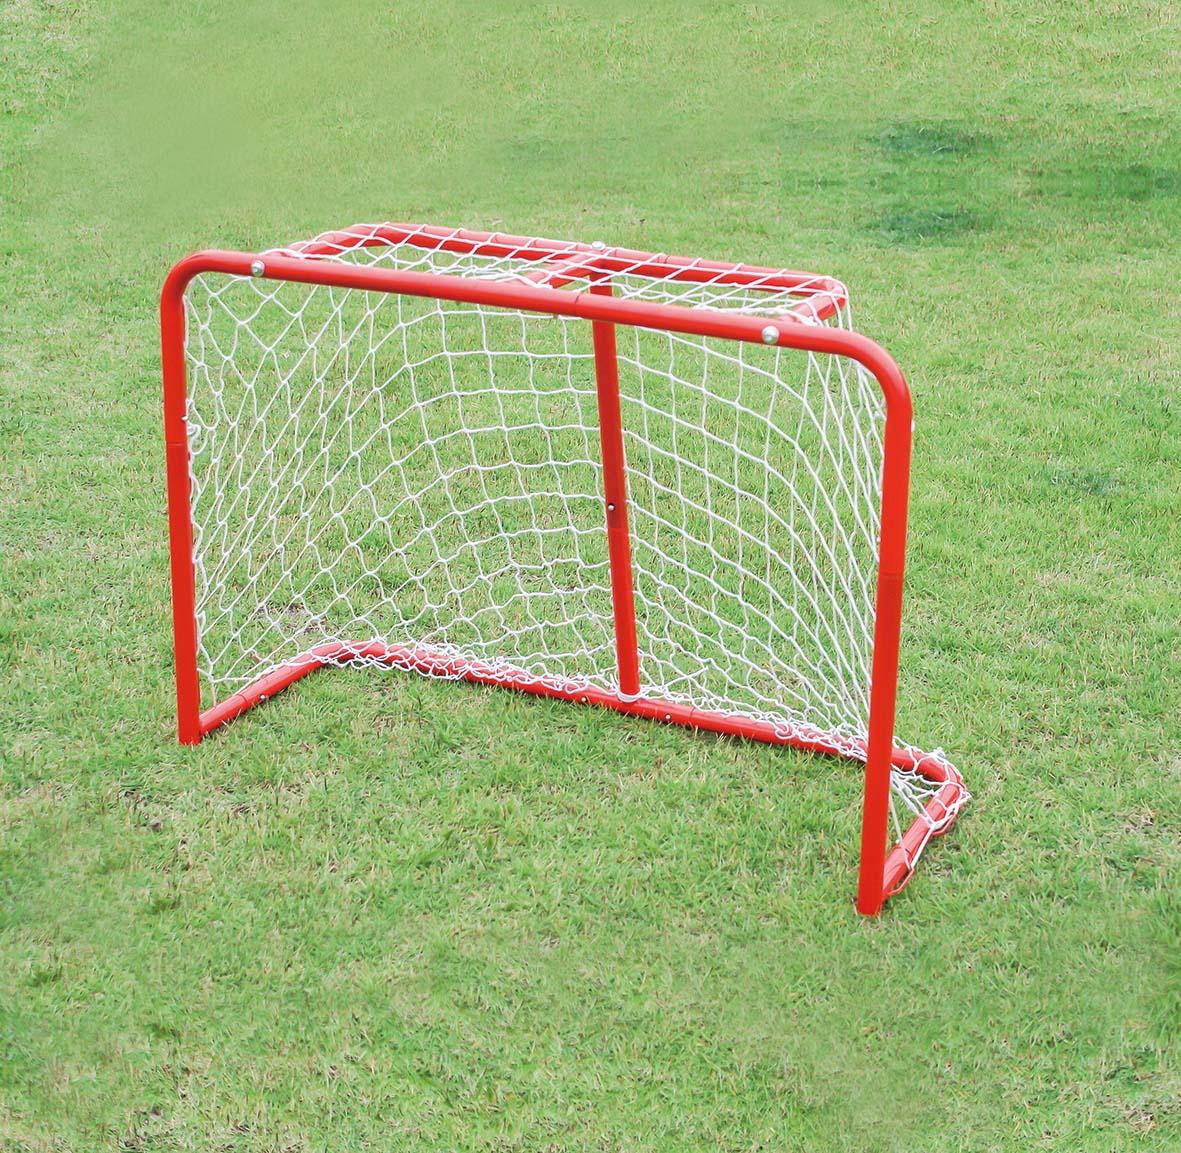 Playfun - Mini Goal 81,5x54x31 cm (5317)